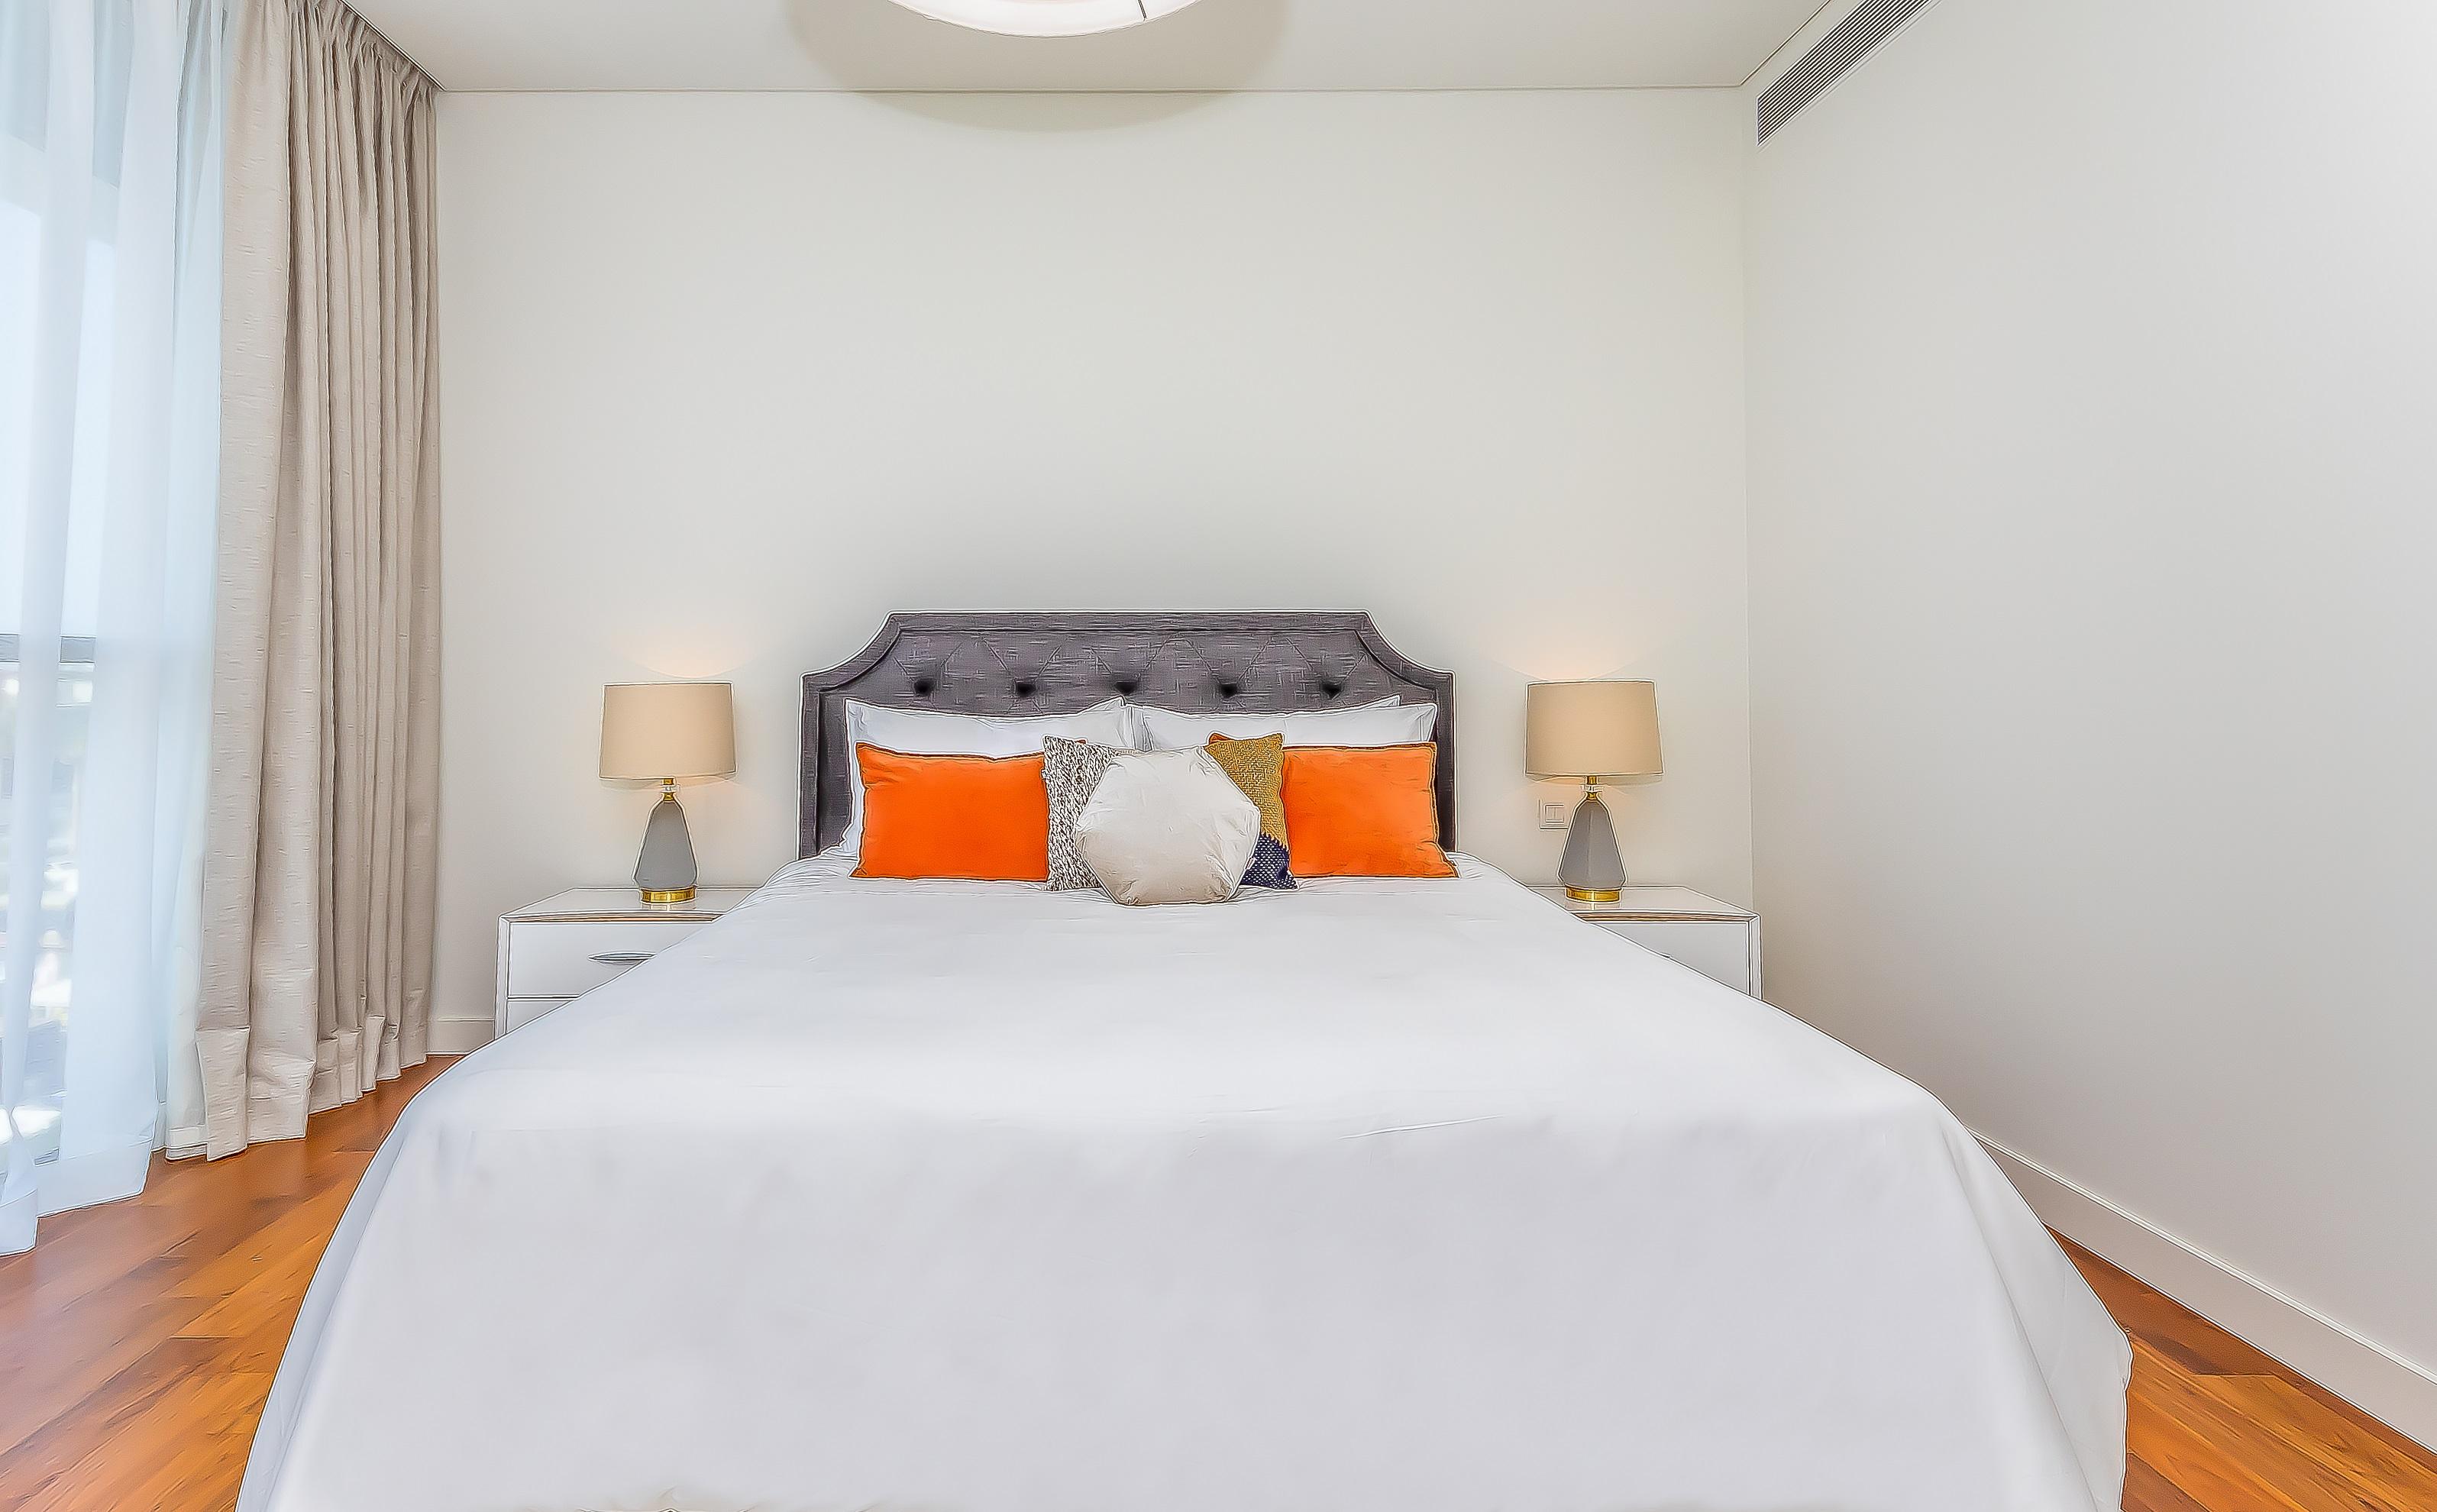 Apartment  Remarkable Value   Unbeatable Location  3 Beds City Walk B 10 309 photo 24142307